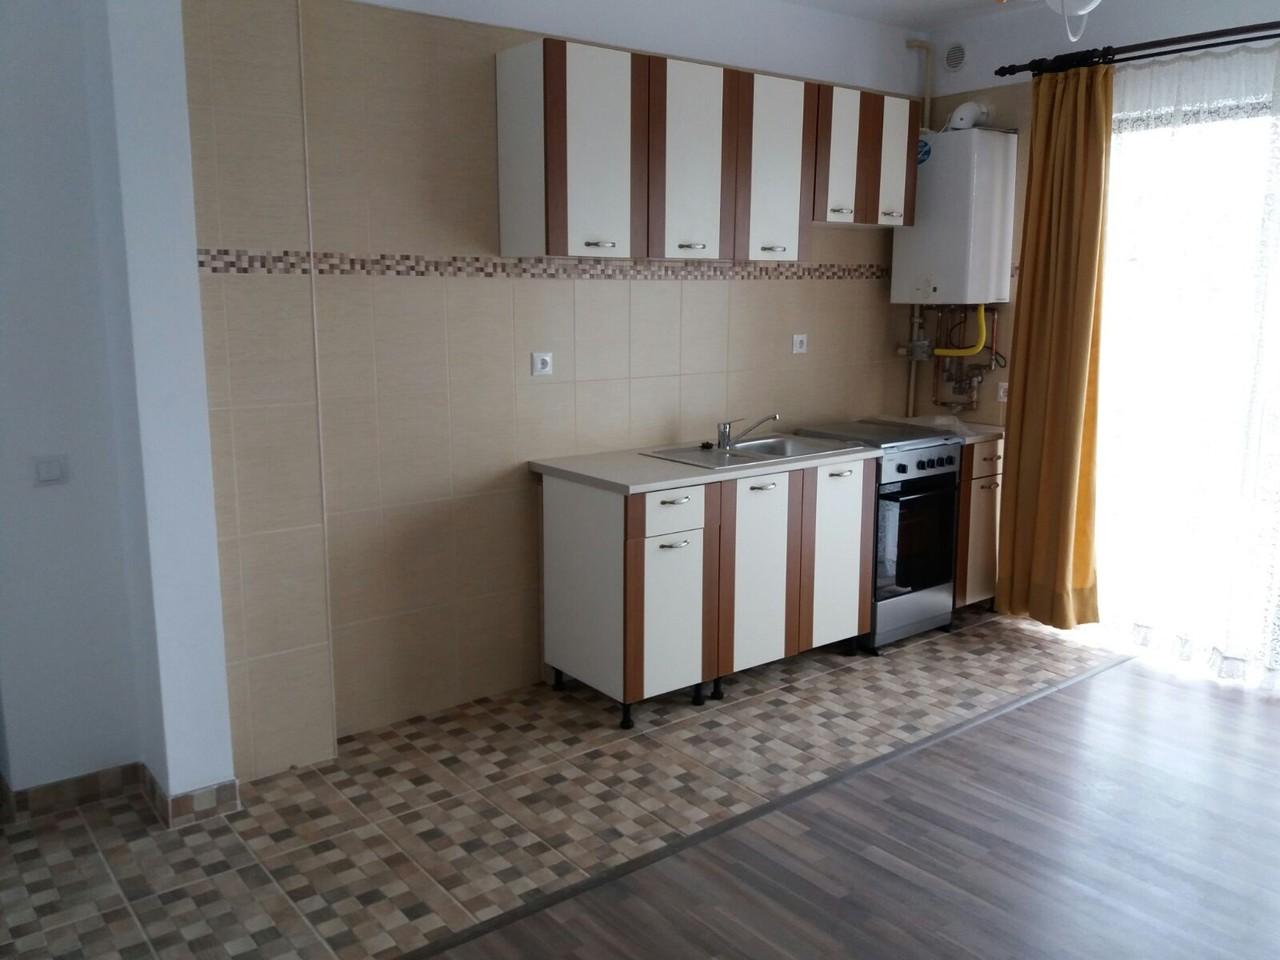 Apartament 2 camere de inchiriat in Sibiu zona Prelungirea Sacel -43-1